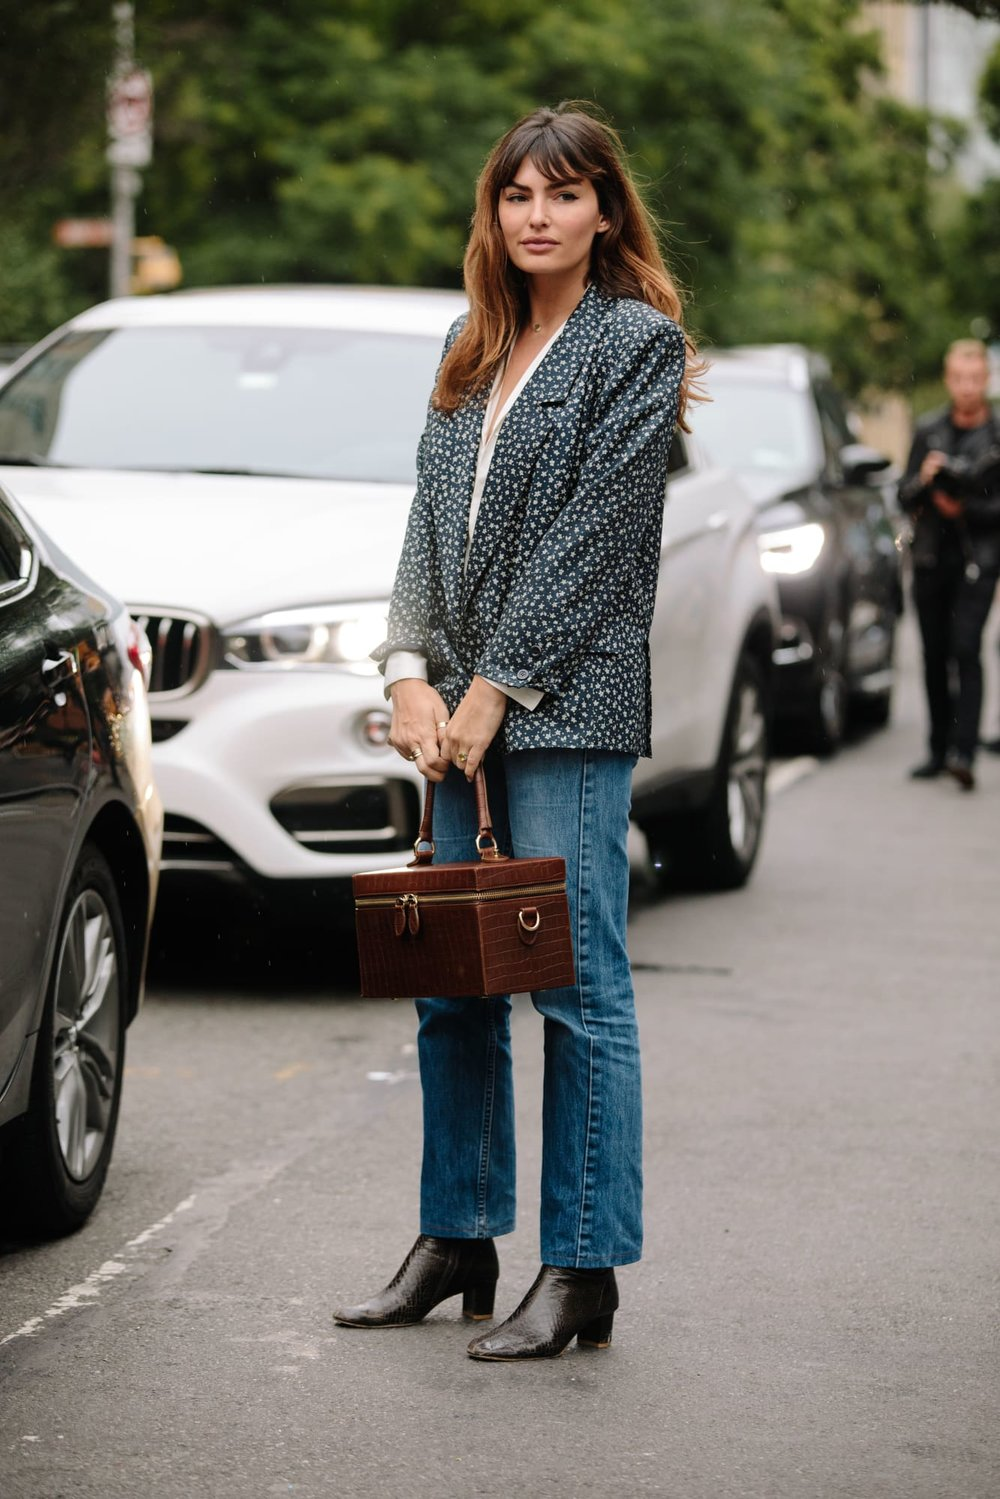 new-york-fashion-week-street-style-spring-2019-day-3-21.jpg